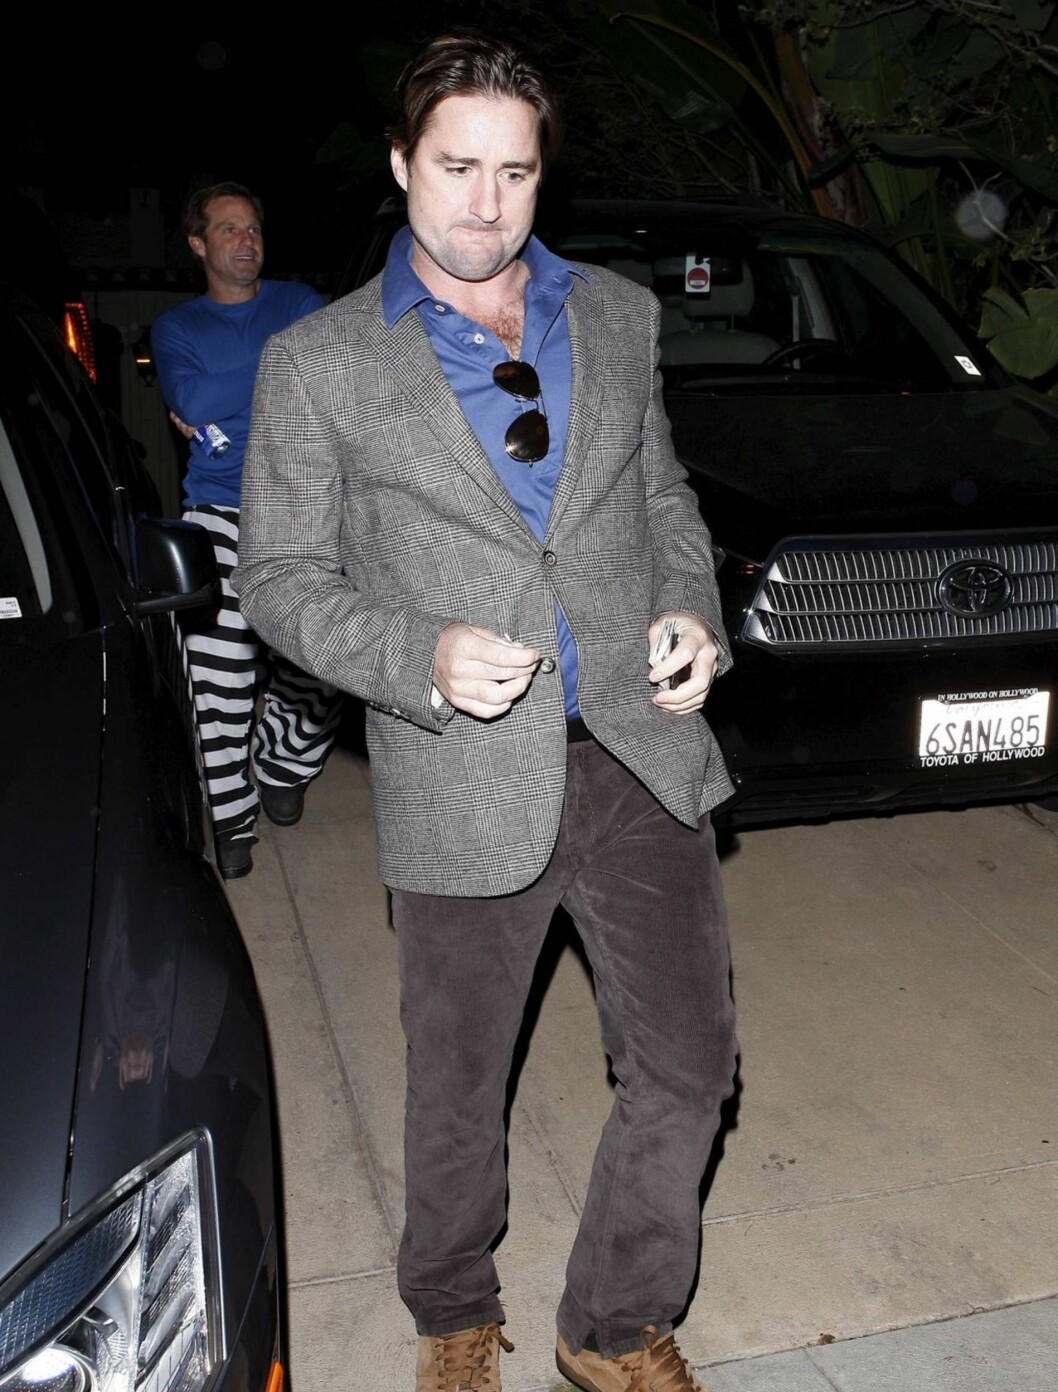 «VICE COP»: Skuespiller Luke Wilson hadde kledd seg ut som en «Vice Cop». Foto: All Over Press